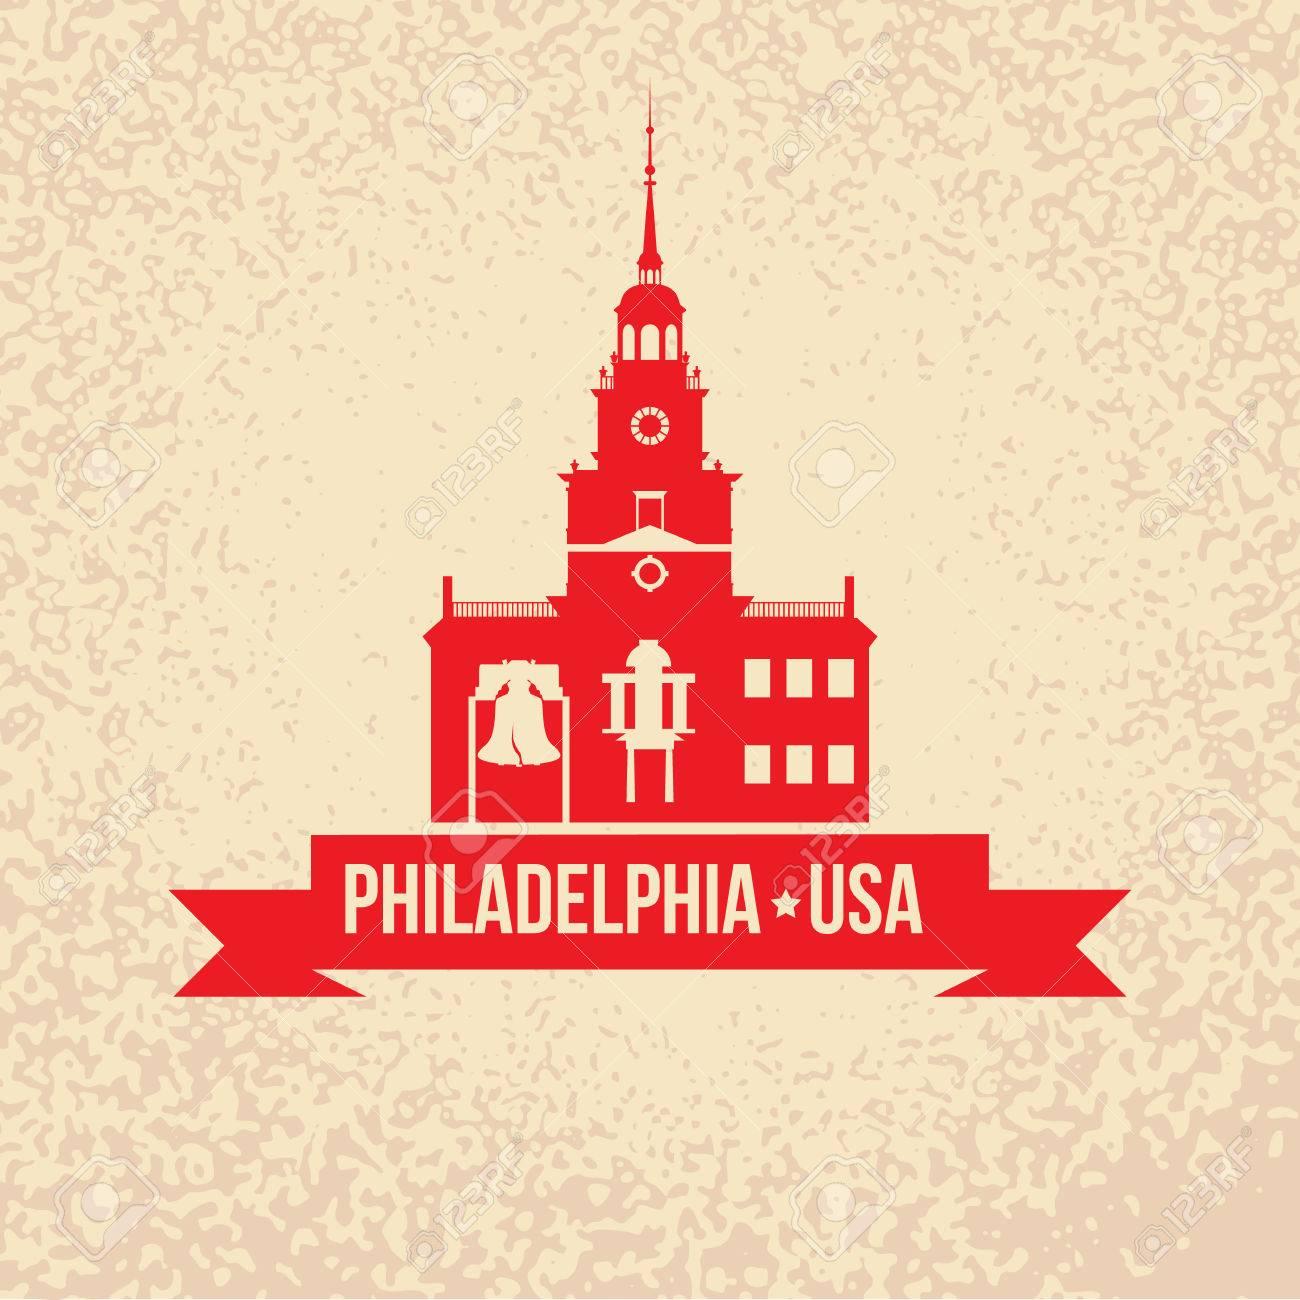 The symbol of philadelphia usa the liberty bell is an iconic the symbol of philadelphia usa the liberty bell is an iconic symbol of american biocorpaavc Images